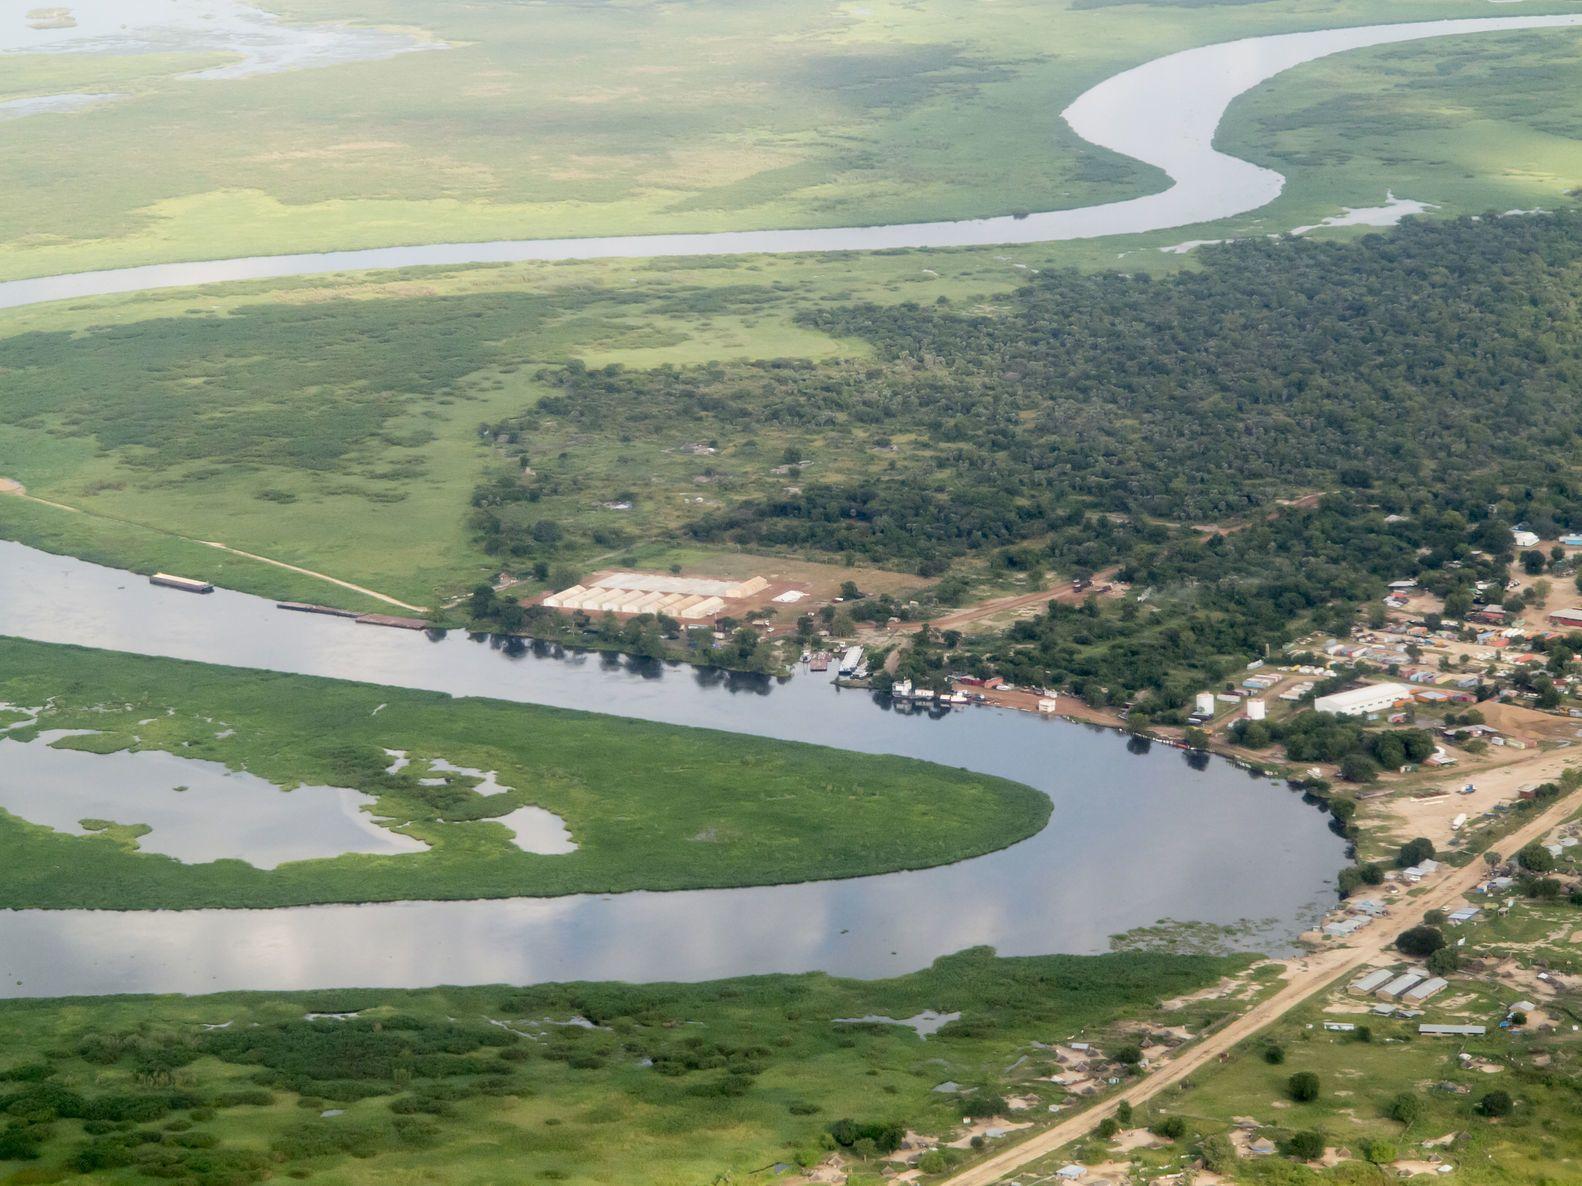 Řeka Nil v Súdánu | wollwerth/123RF.com